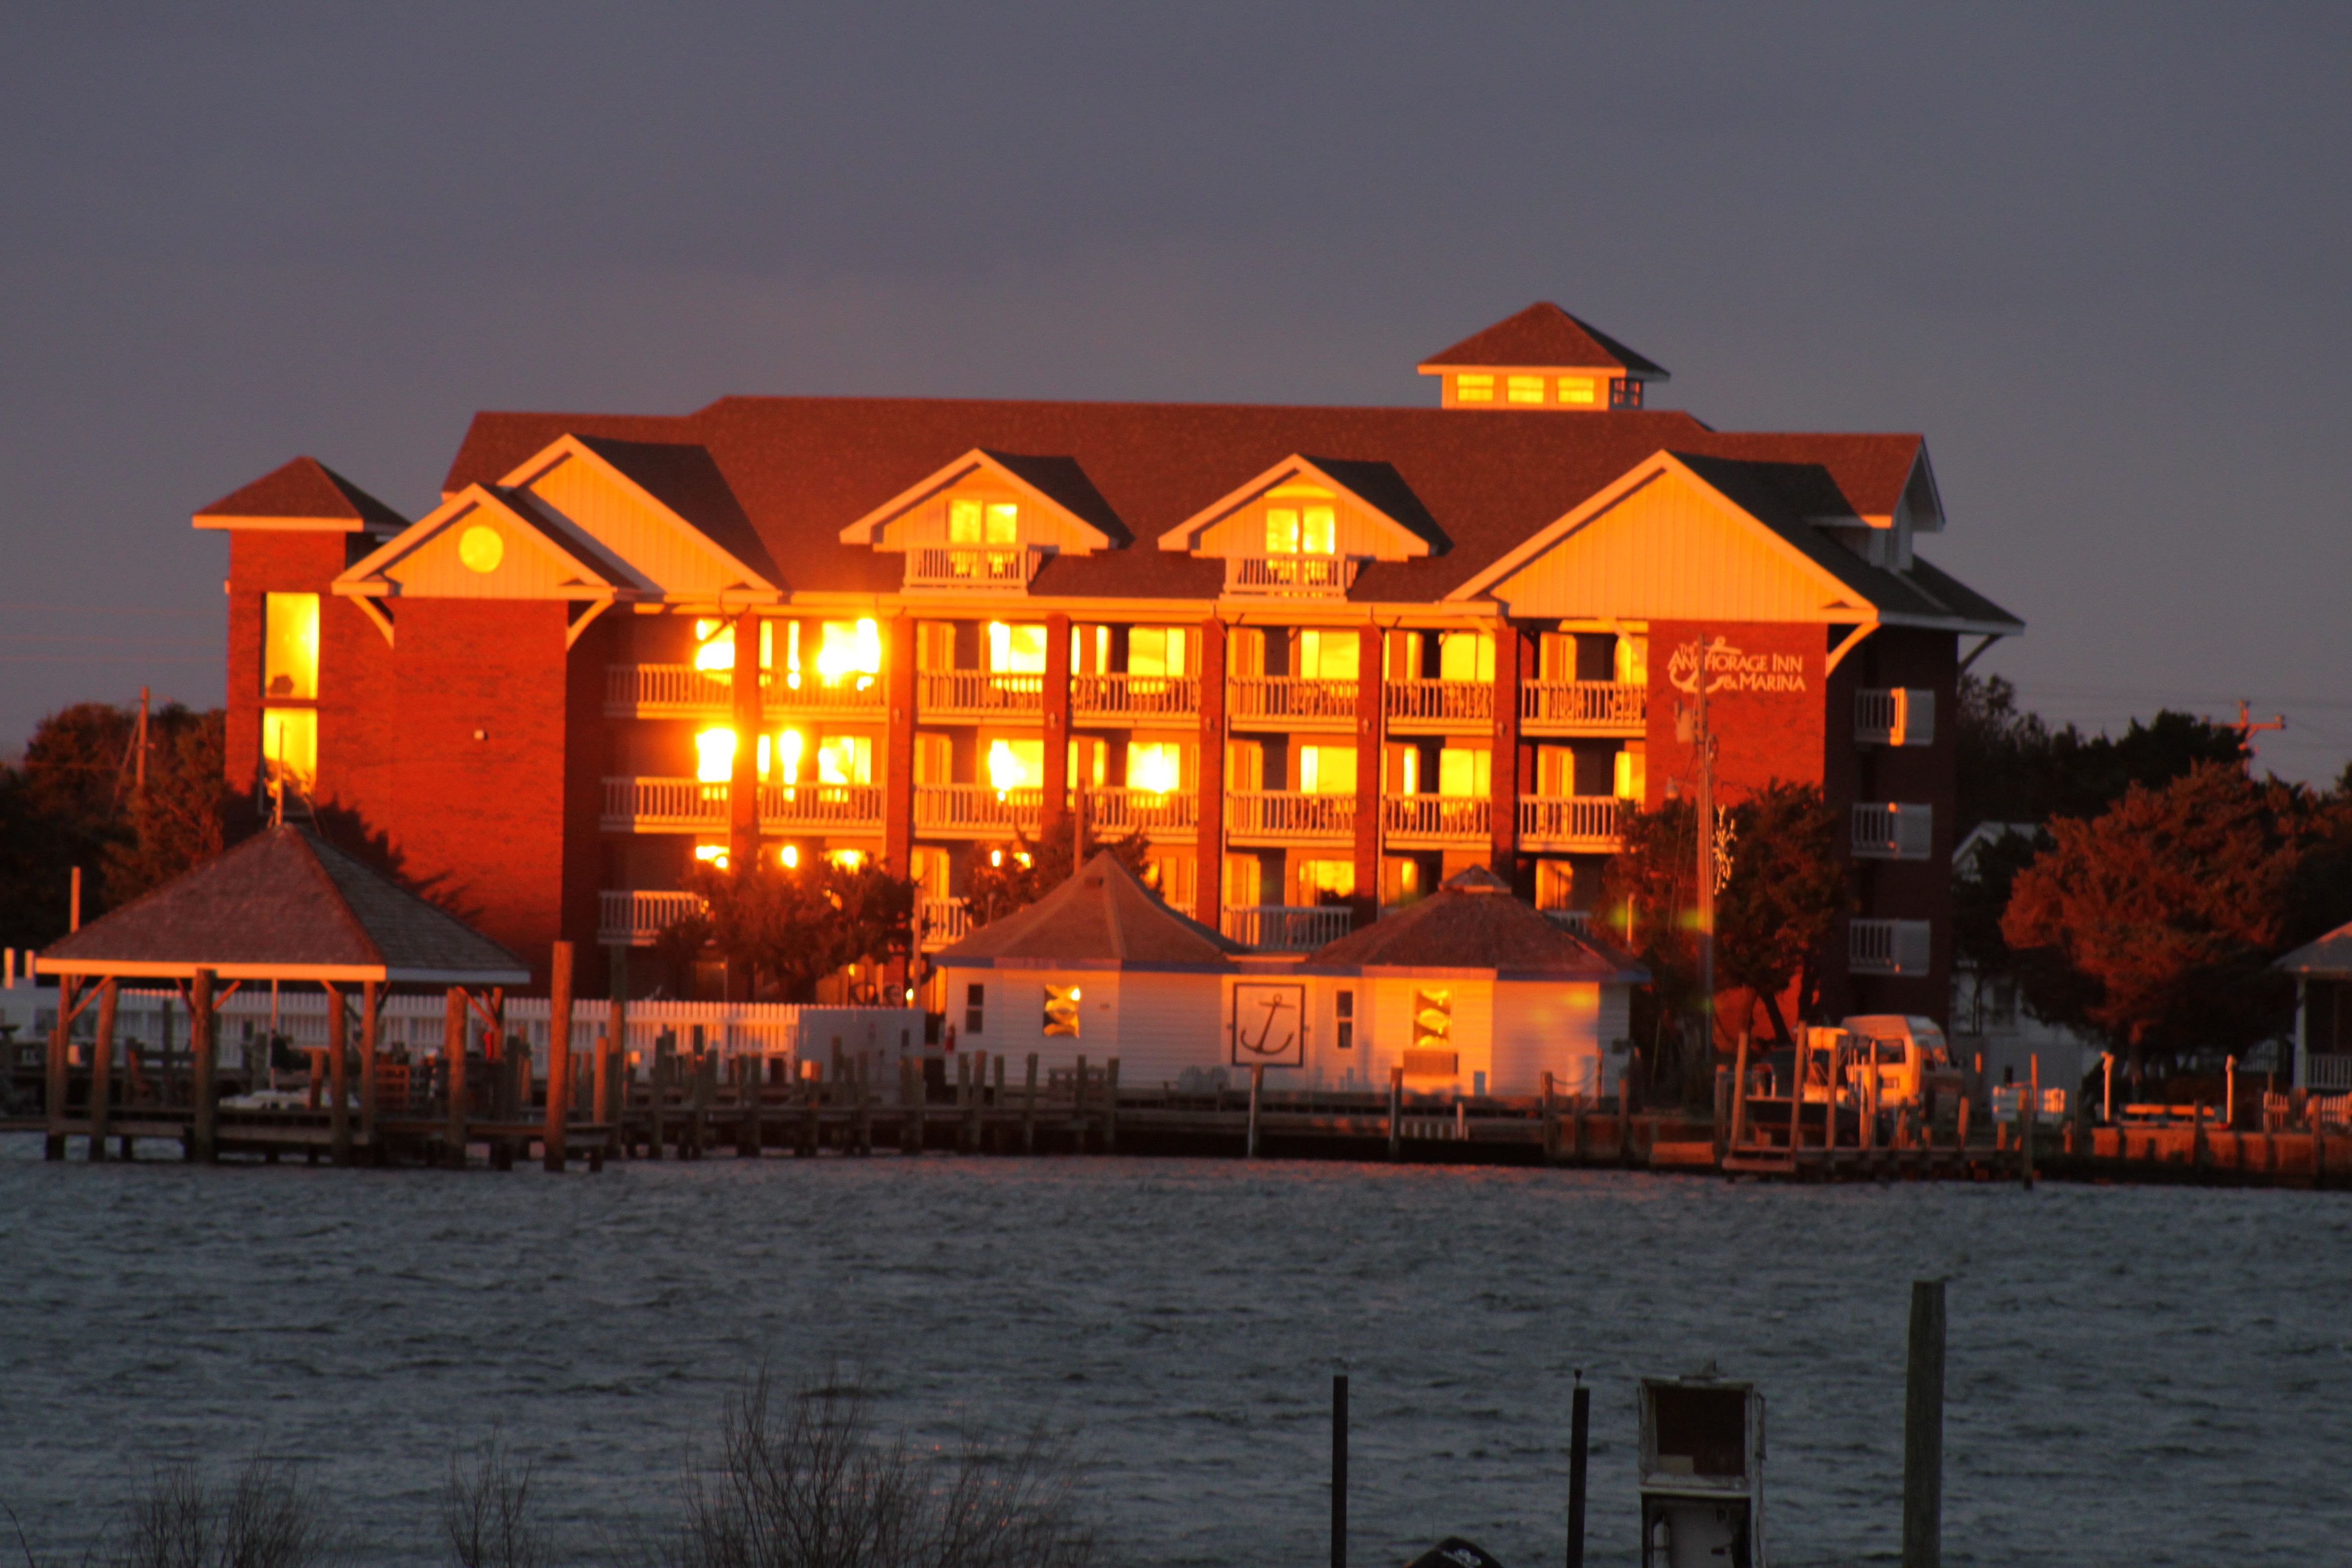 Anchorage Inn At Sunset On Silver Lake Harbor Ocracoke Island Silver Lake Ocracoke